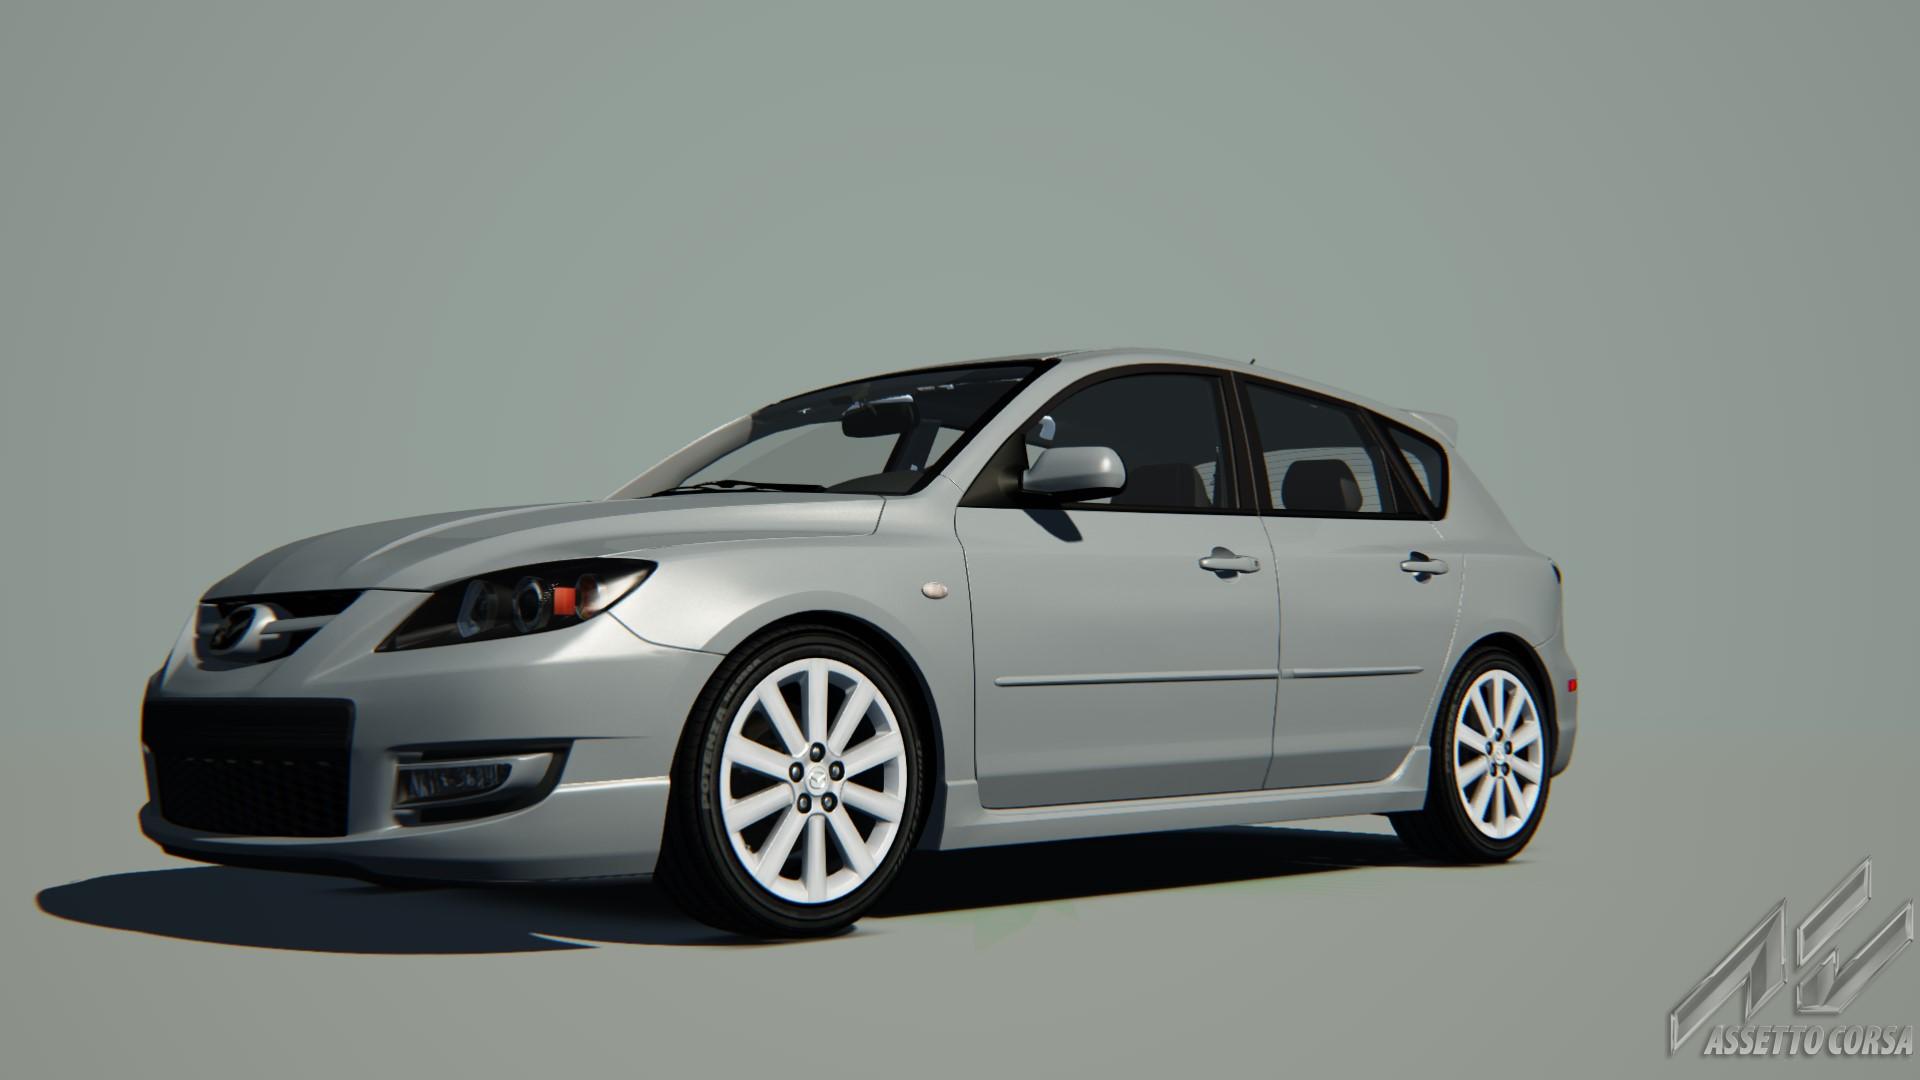 Mazda 3 MazdaSpeed Mazda Car Detail Assetto Corsa Database